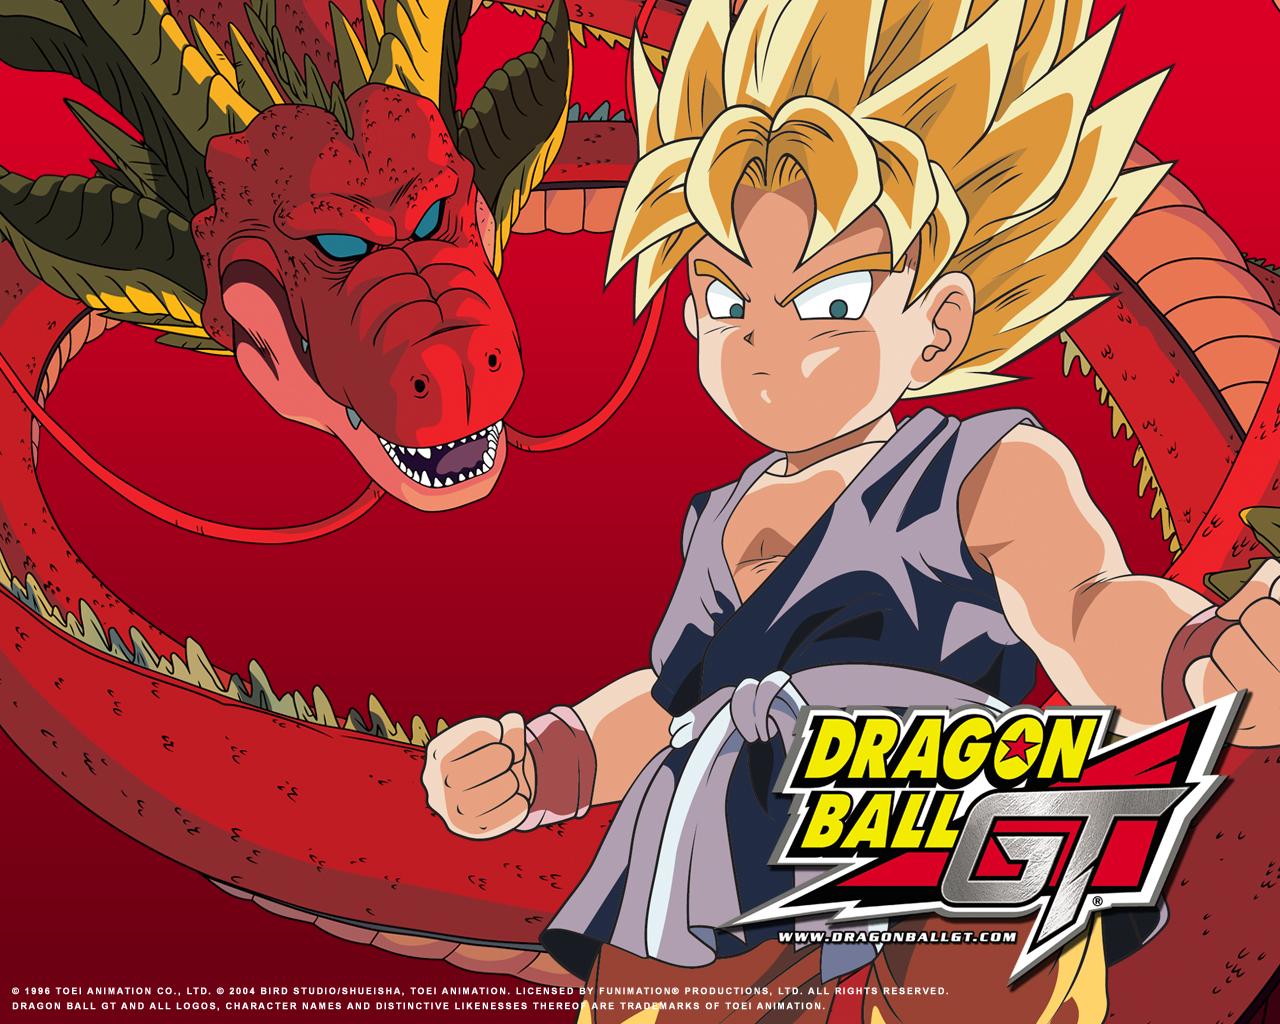 Dragon Ball Gt Z Full HD Wallpapers Jogos Online Wx 1280x1024